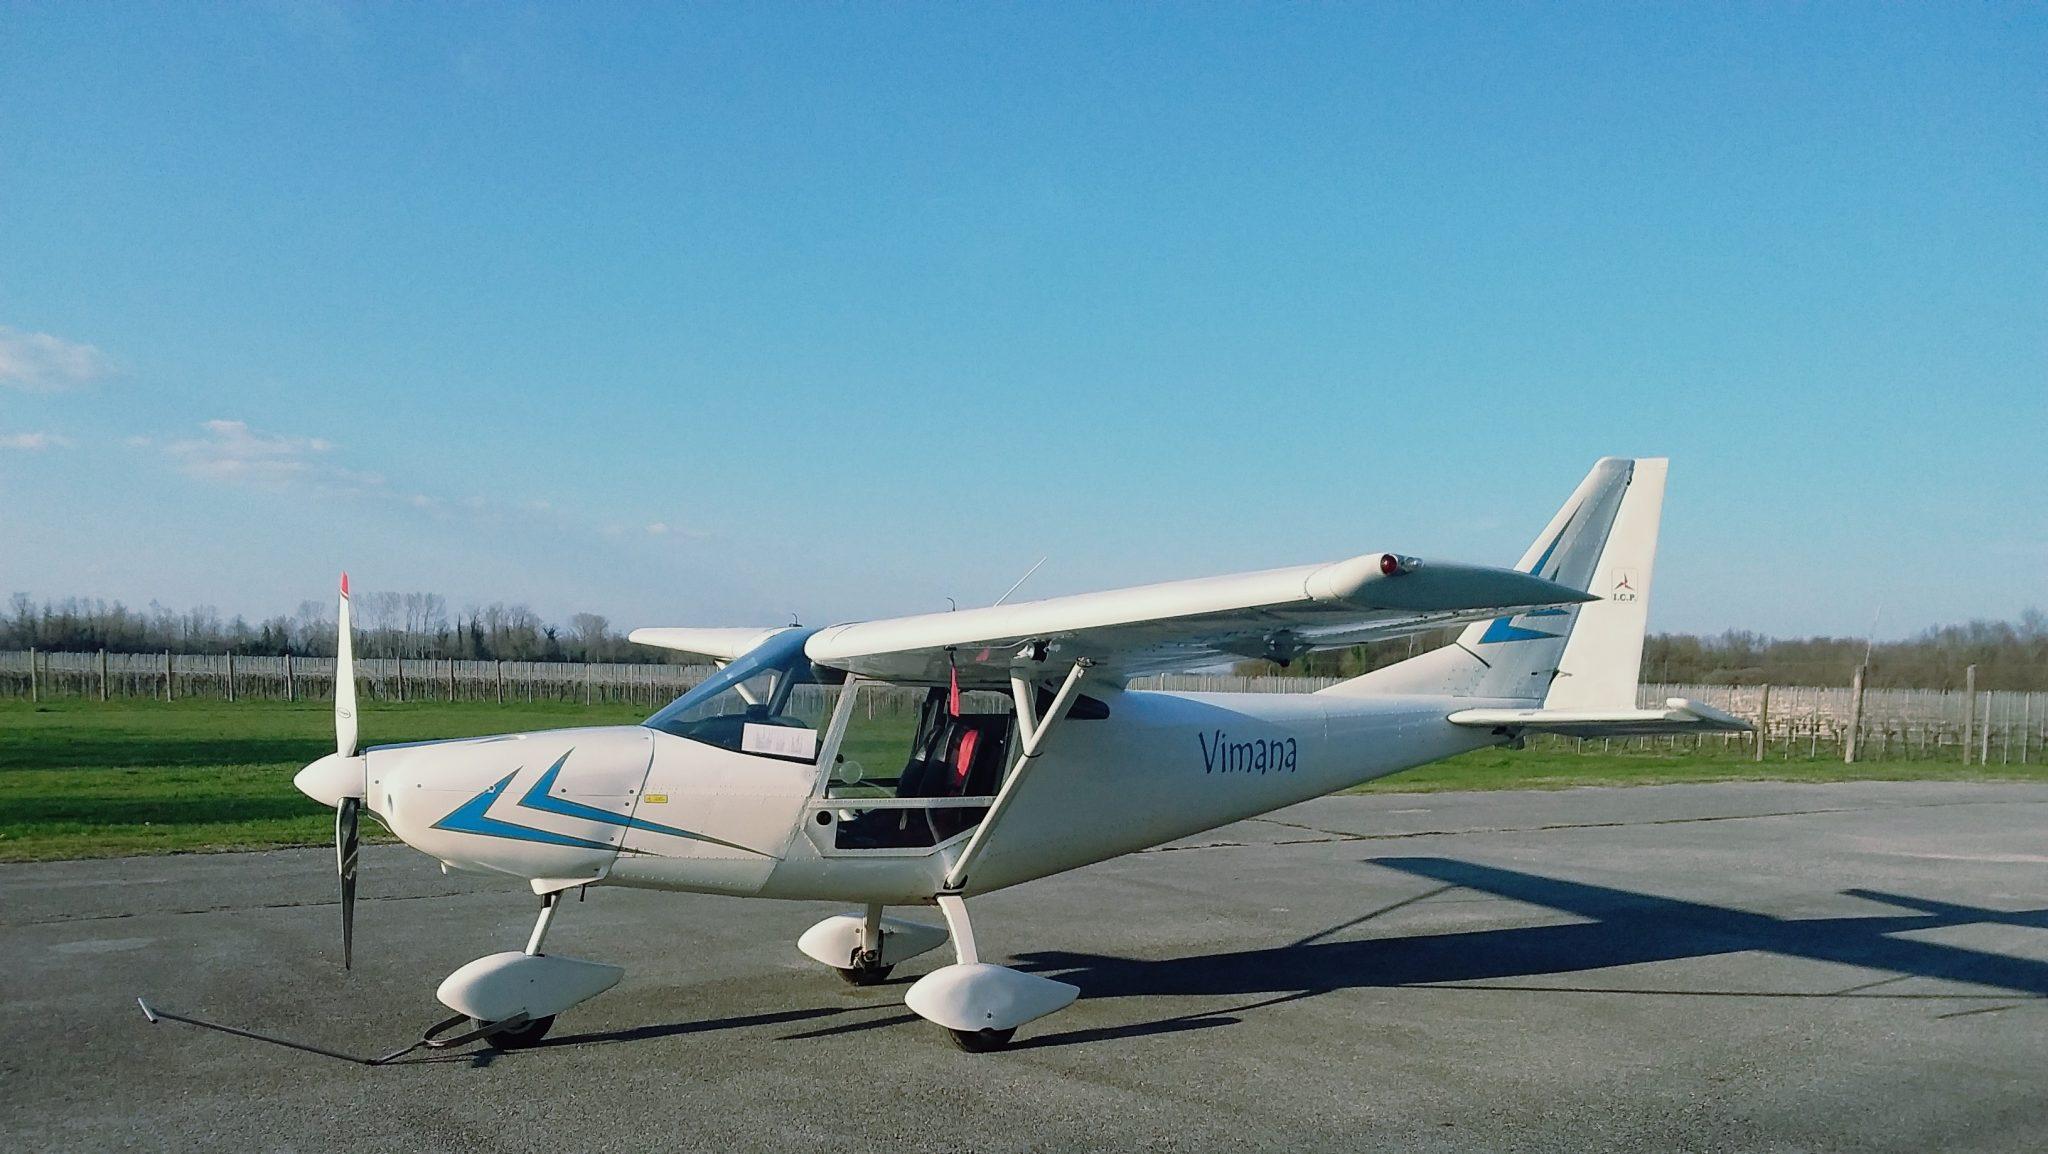 Elicottero Usato : Icp aviazione vimana usato mercatino ultraleggero